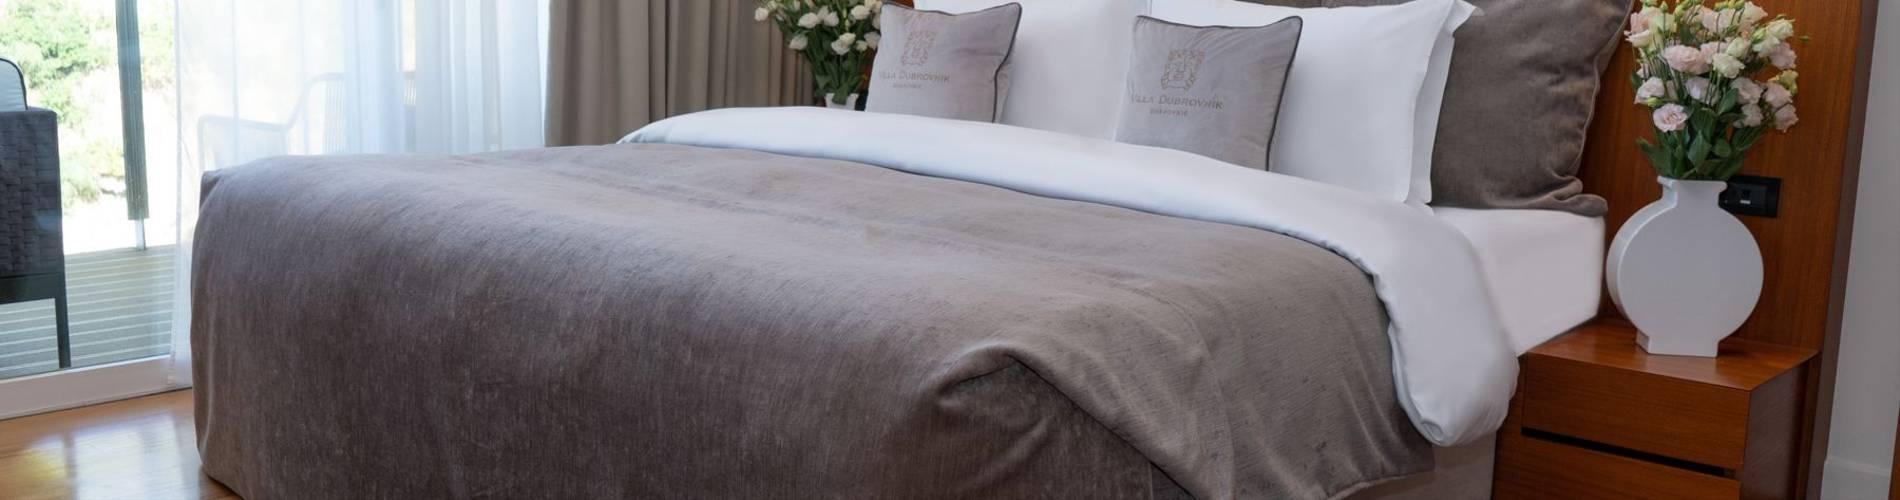 Suite at Hotel Villa Dubrovnik.jpg